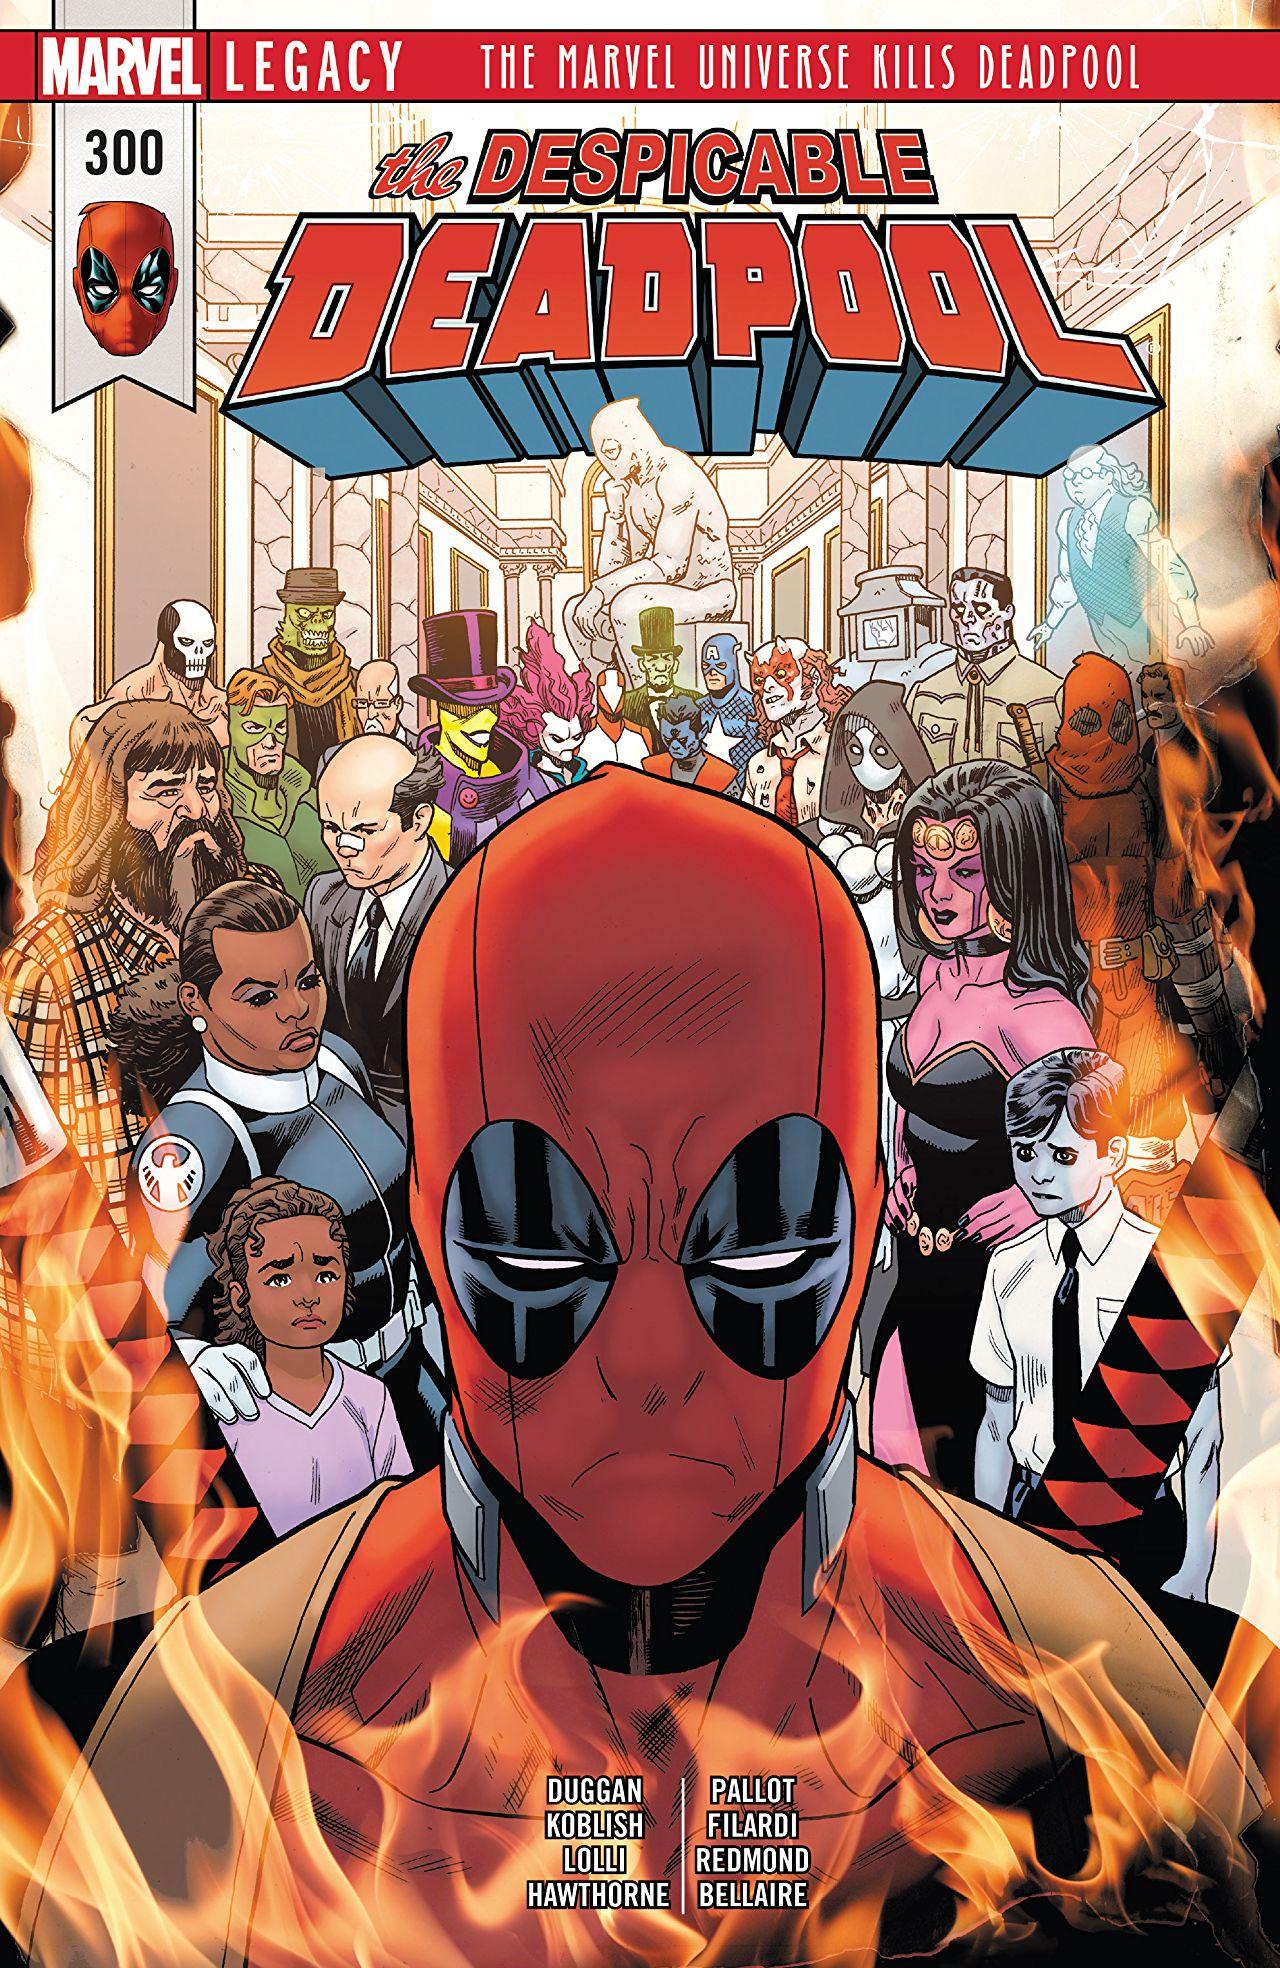 Marvel Legacy - Despicable Deadpool 300